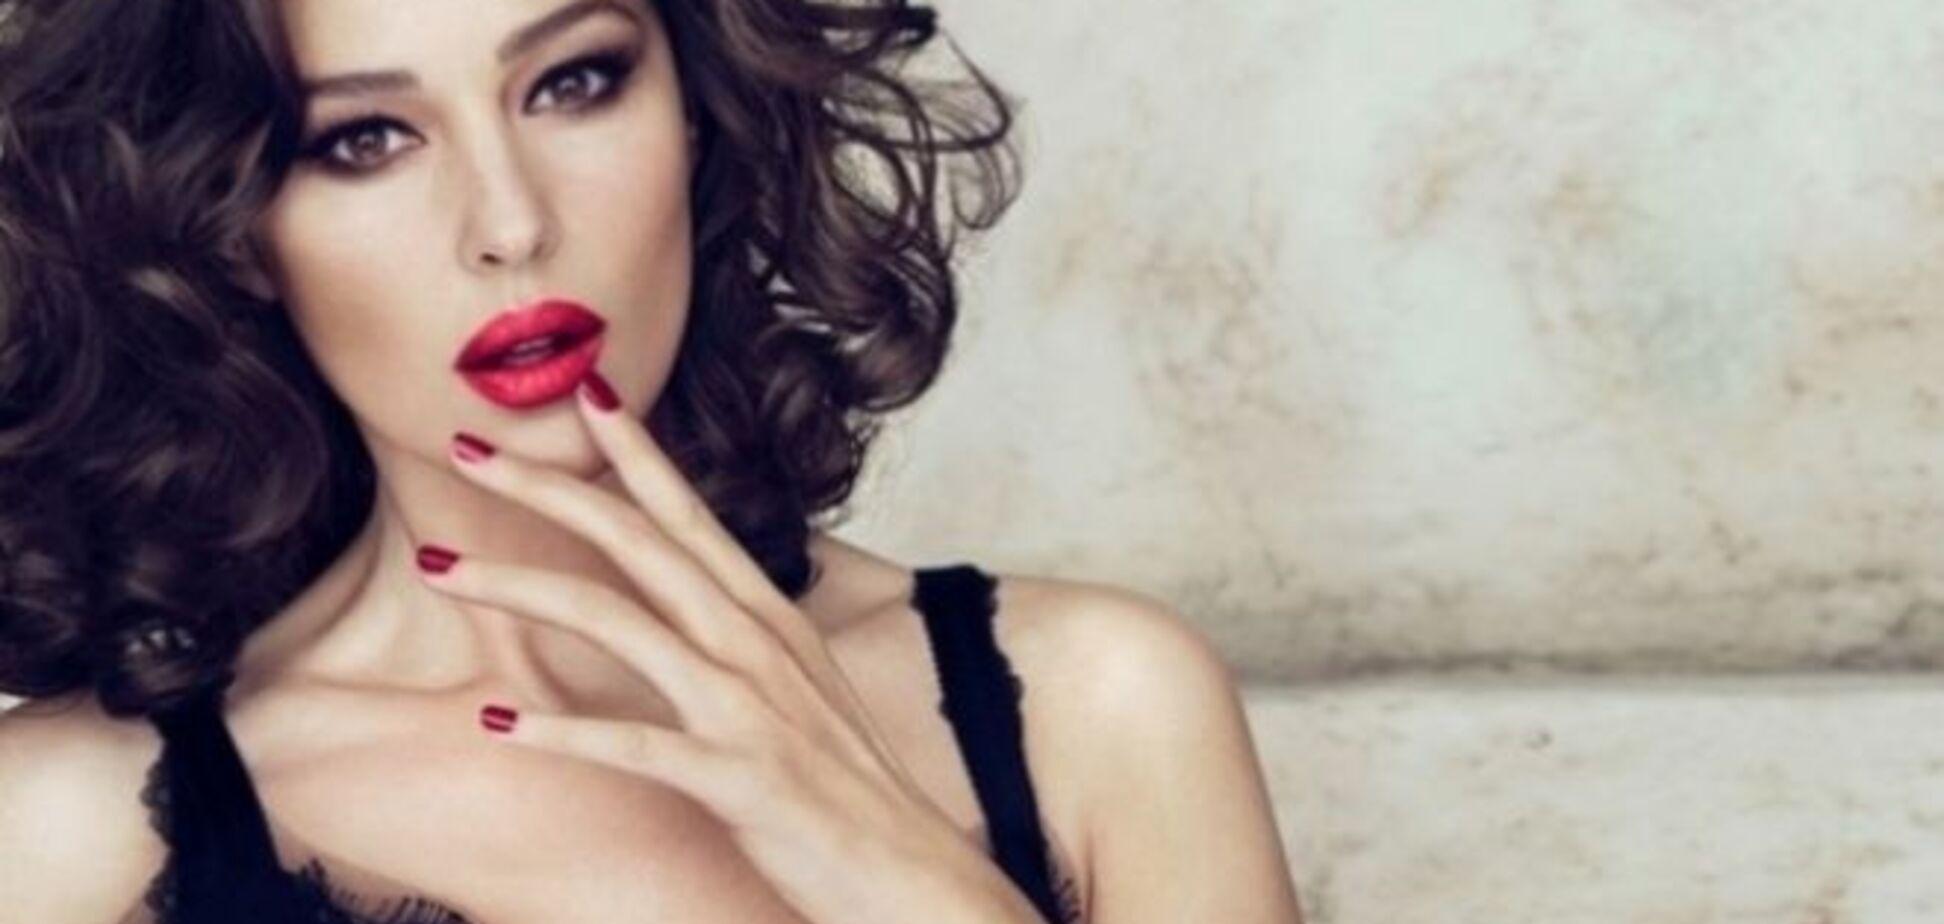 Моника Беллуччи обнажила грудь на людях